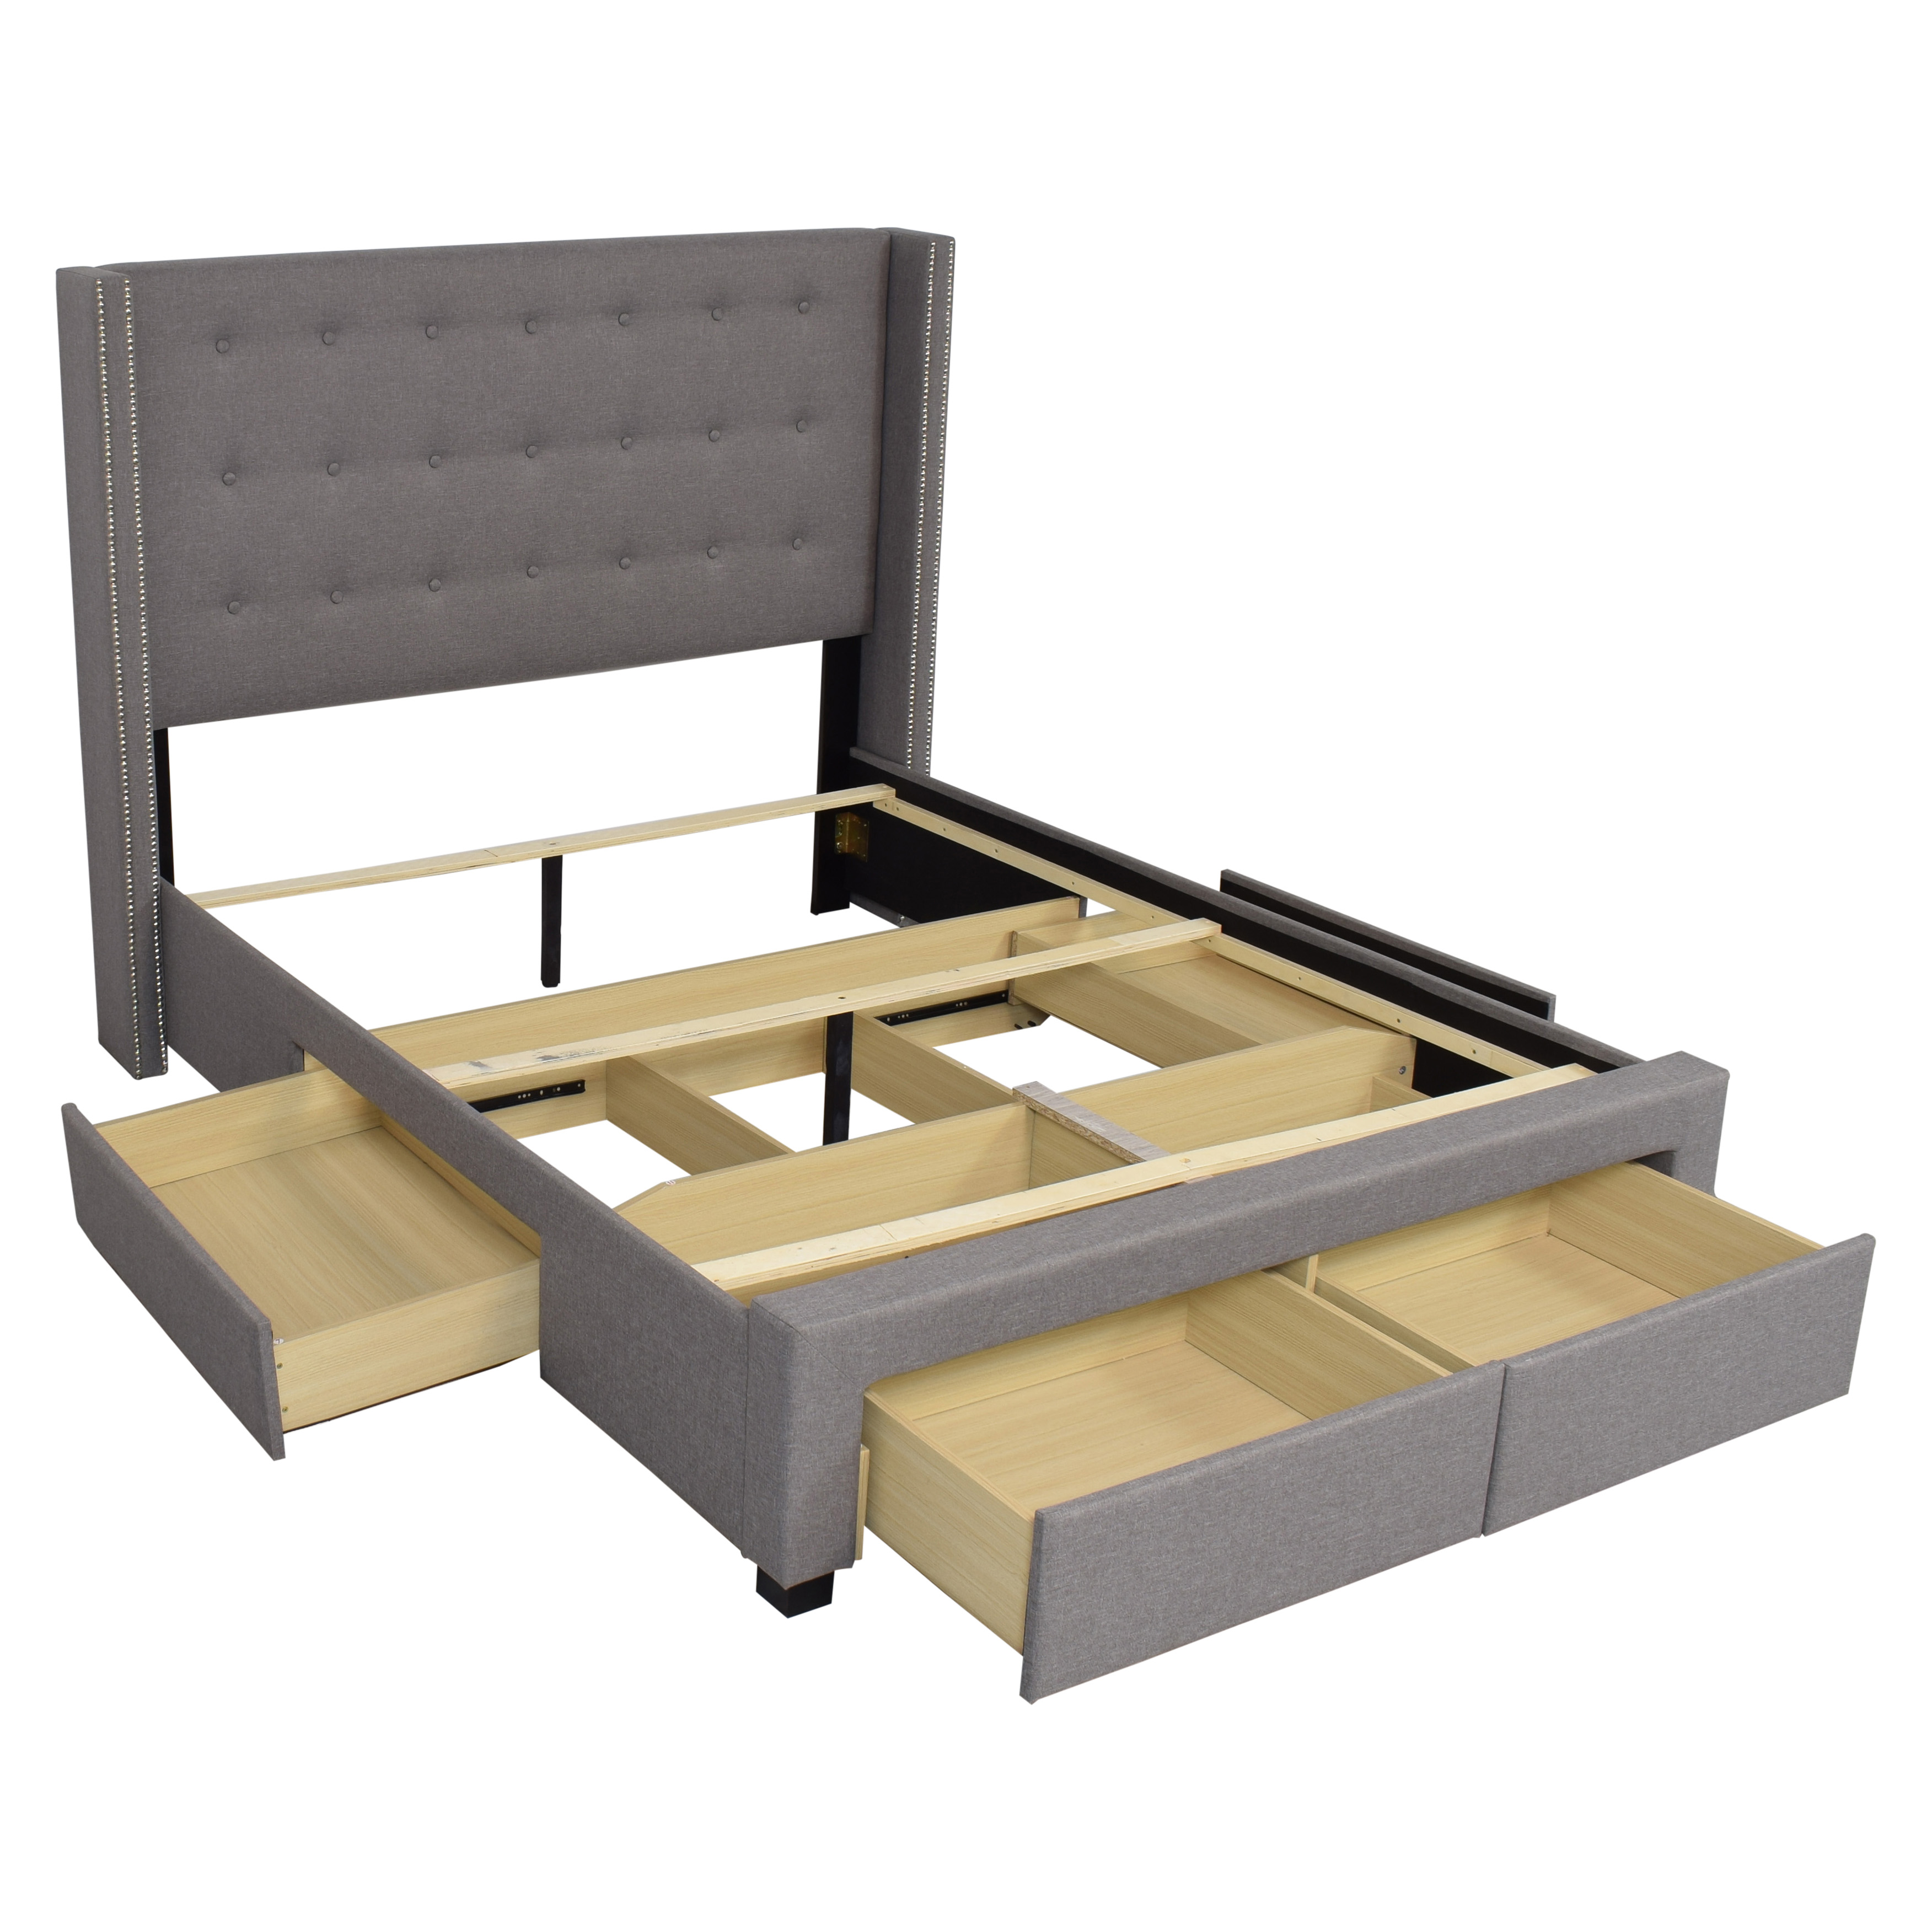 Strick & Bolton Strick & Bolton Wingback Queen Storage Bed grey